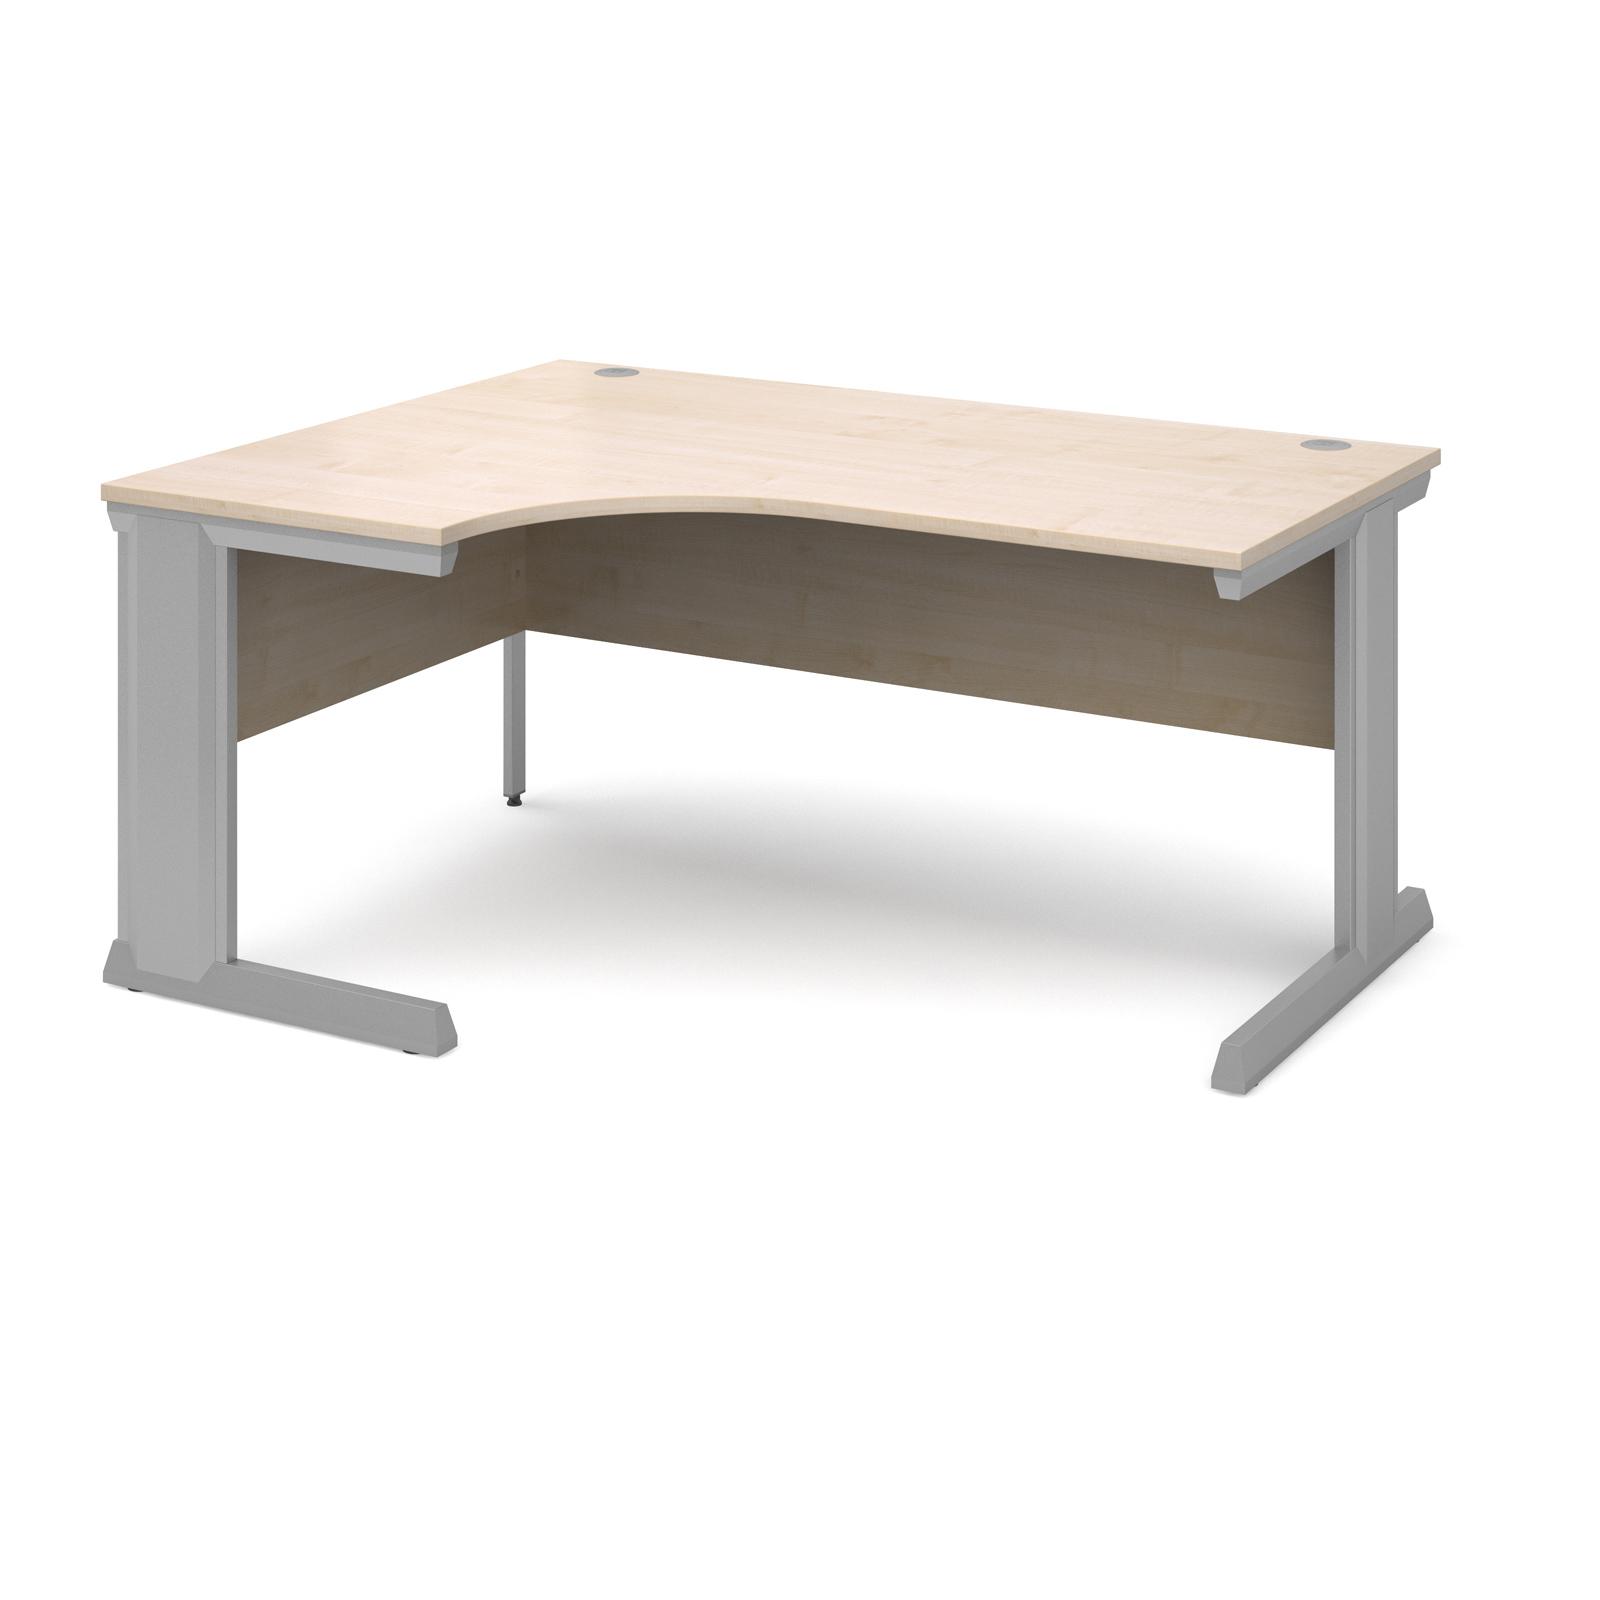 Compare prices for Vivo Left Hand Ergonomic Desk 1600mm - Silver Frame Maple Top